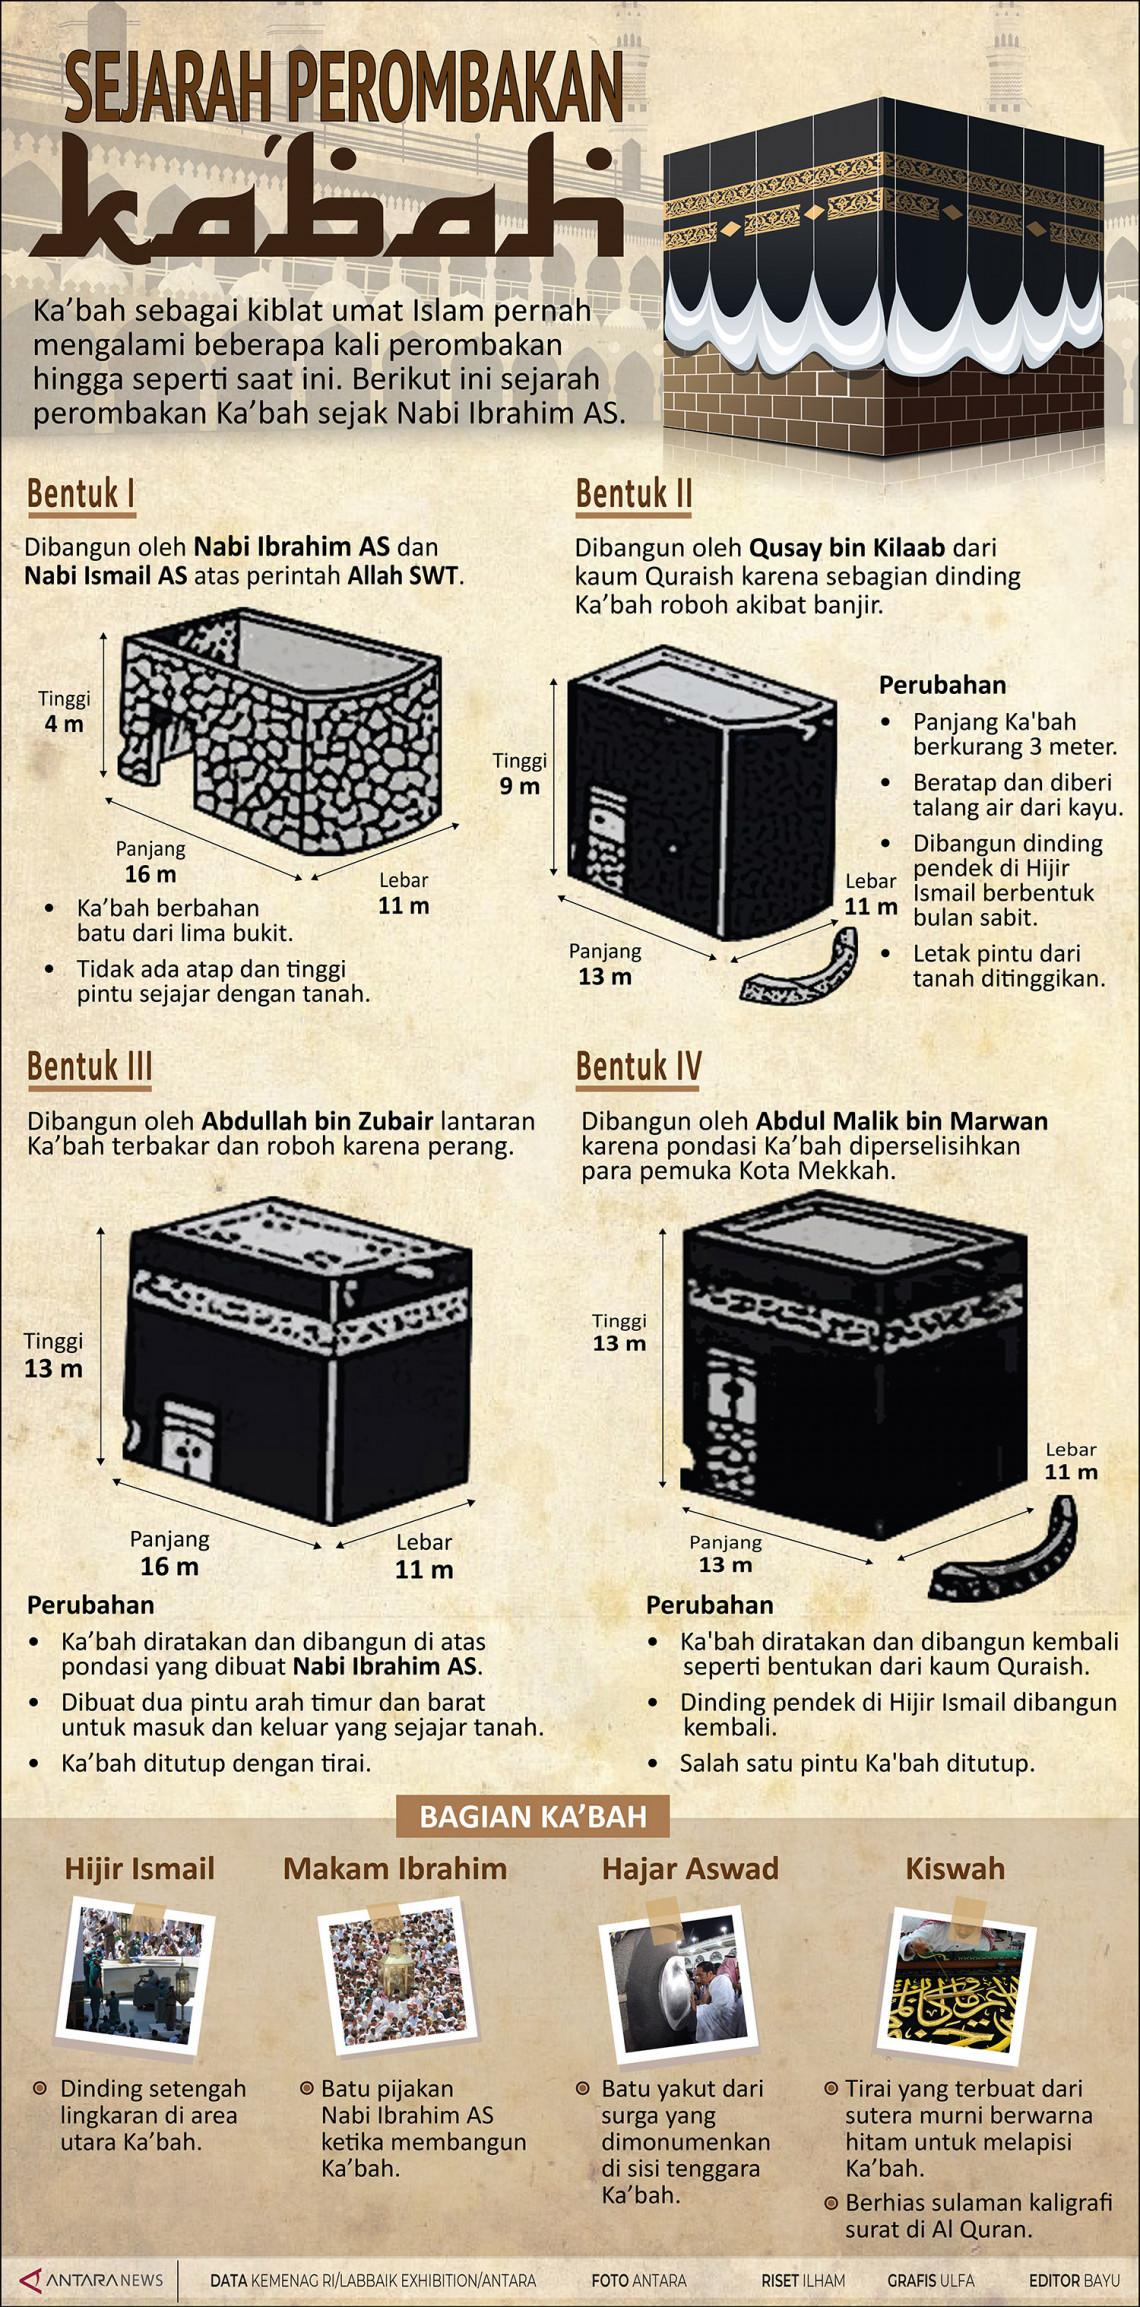 Sejarah perombakan Ka'bah